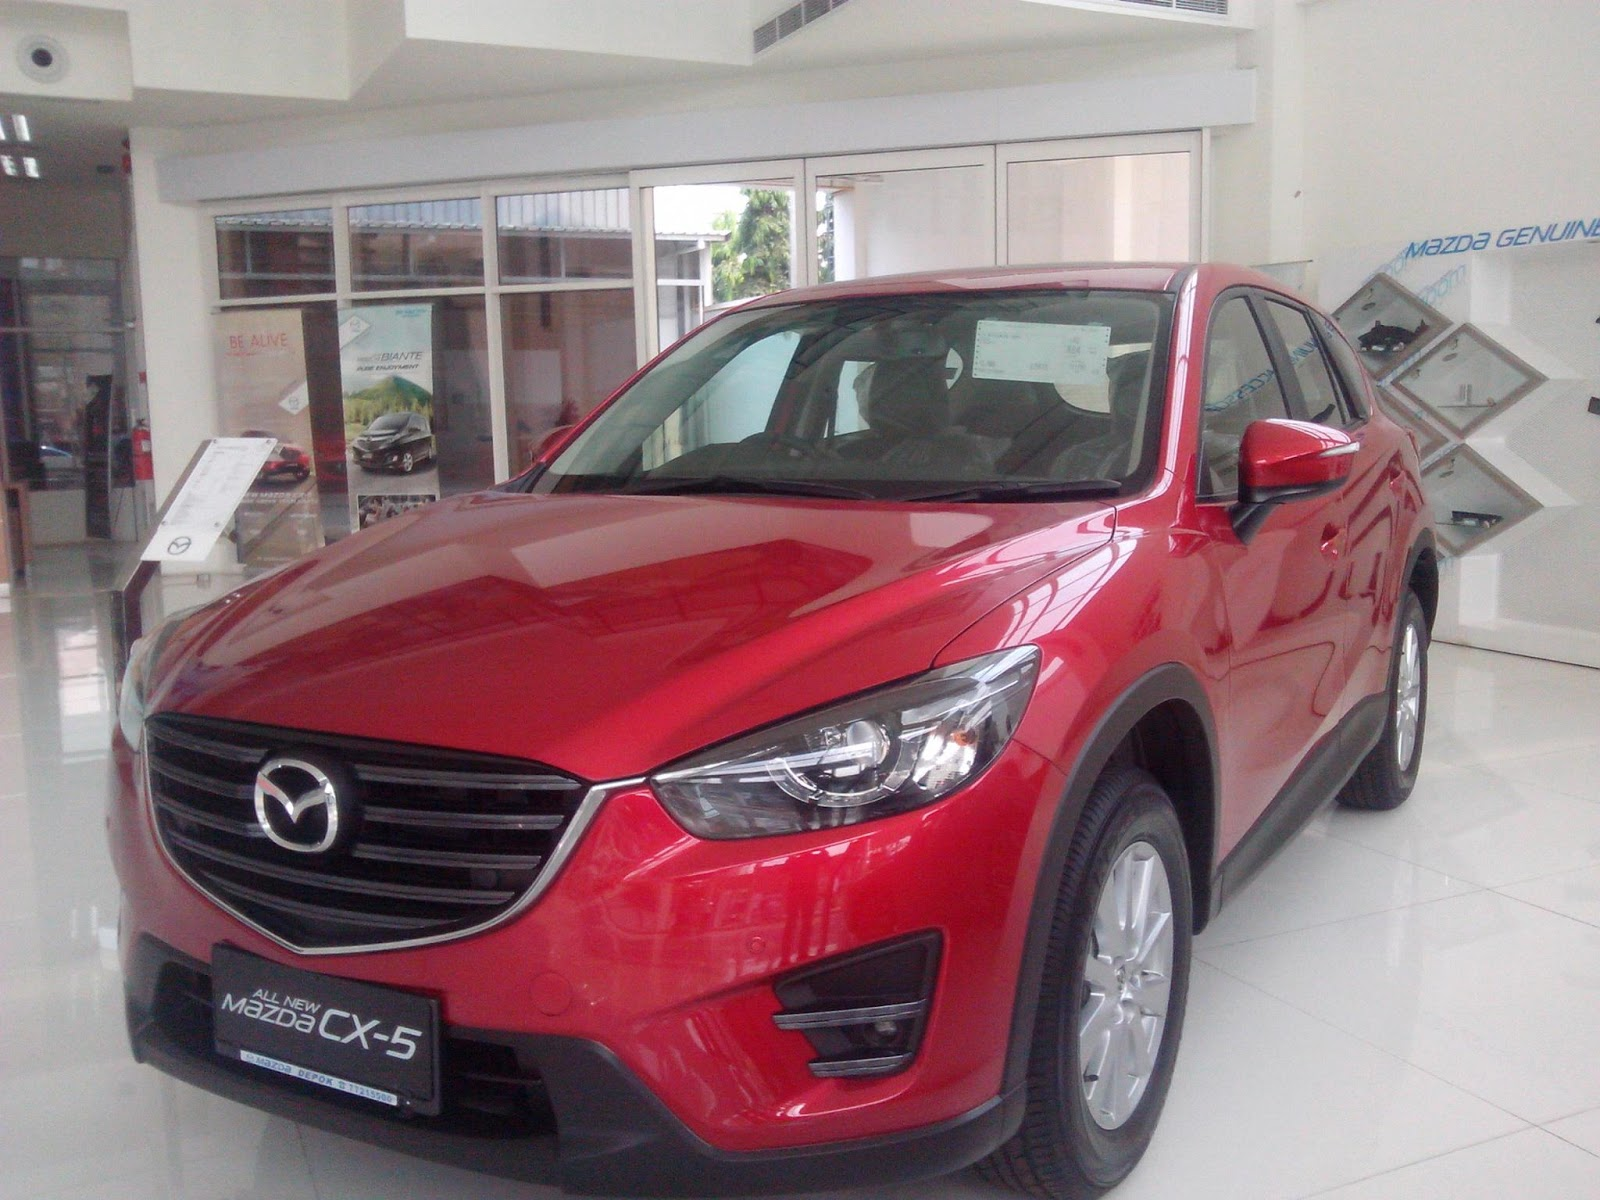 Mazda discount coupons